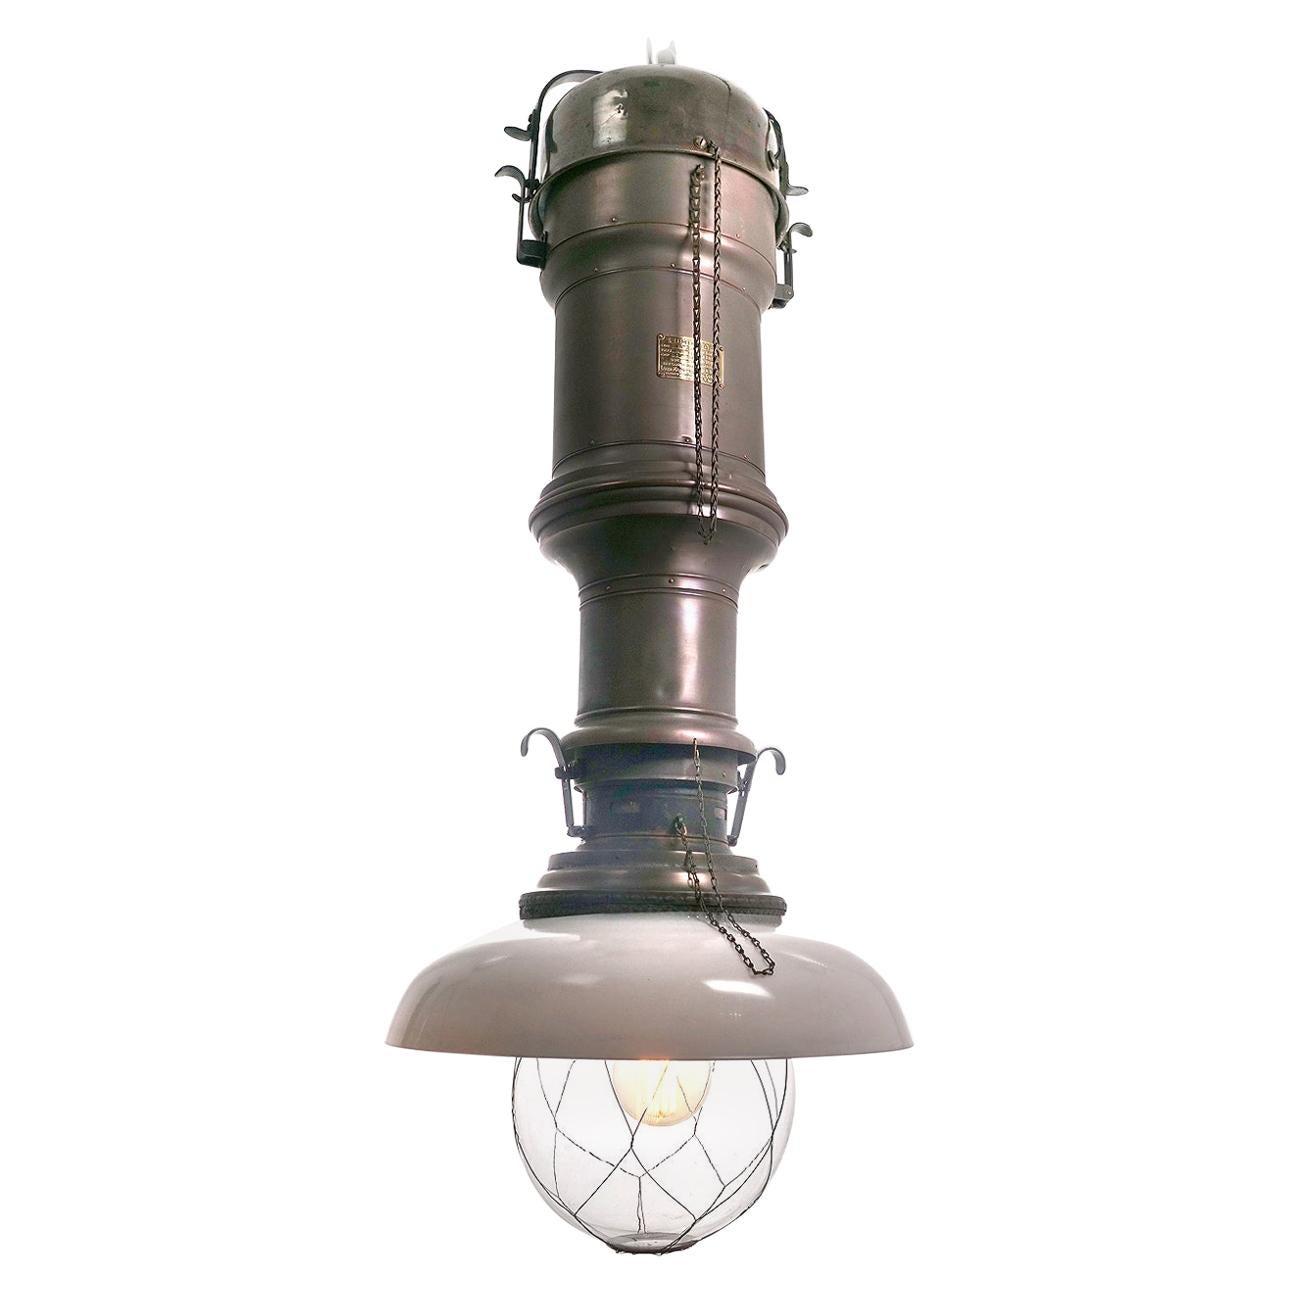 Rare and Dramatic 1880s Luminator Fairground Lamp